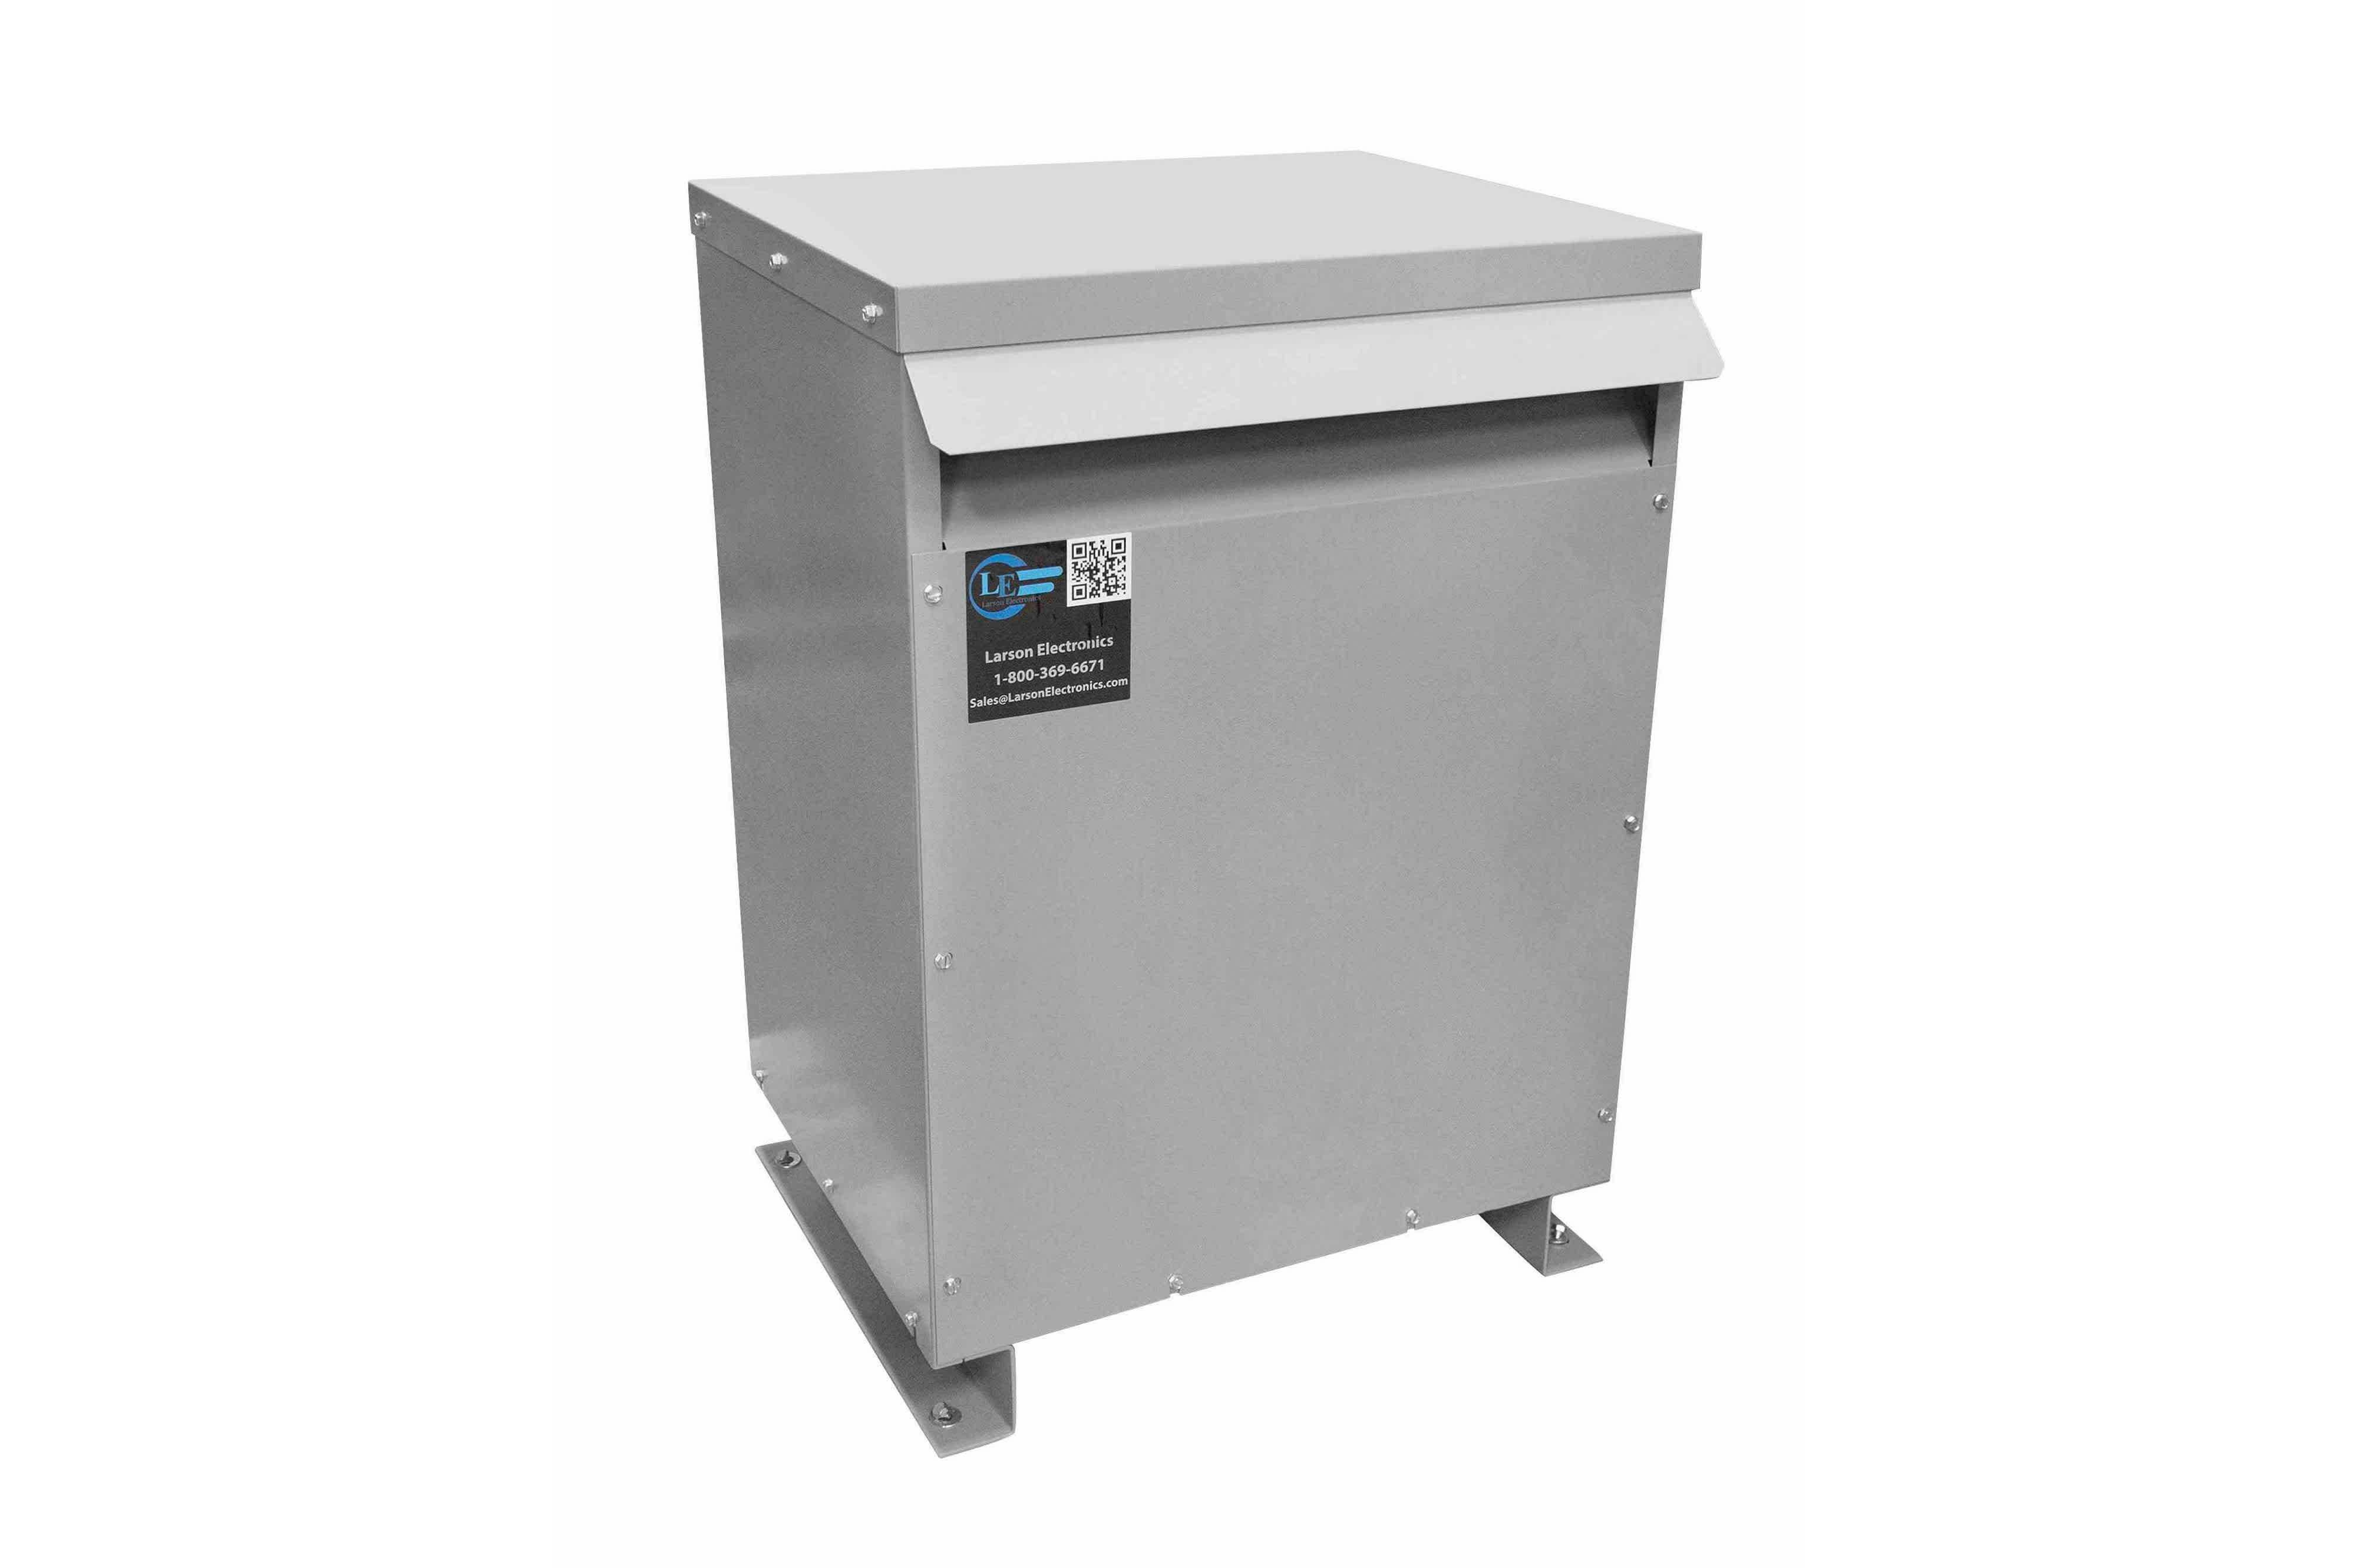 100 kVA 3PH DOE Transformer, 480V Delta Primary, 208Y/120 Wye-N Secondary, N3R, Ventilated, 60 Hz